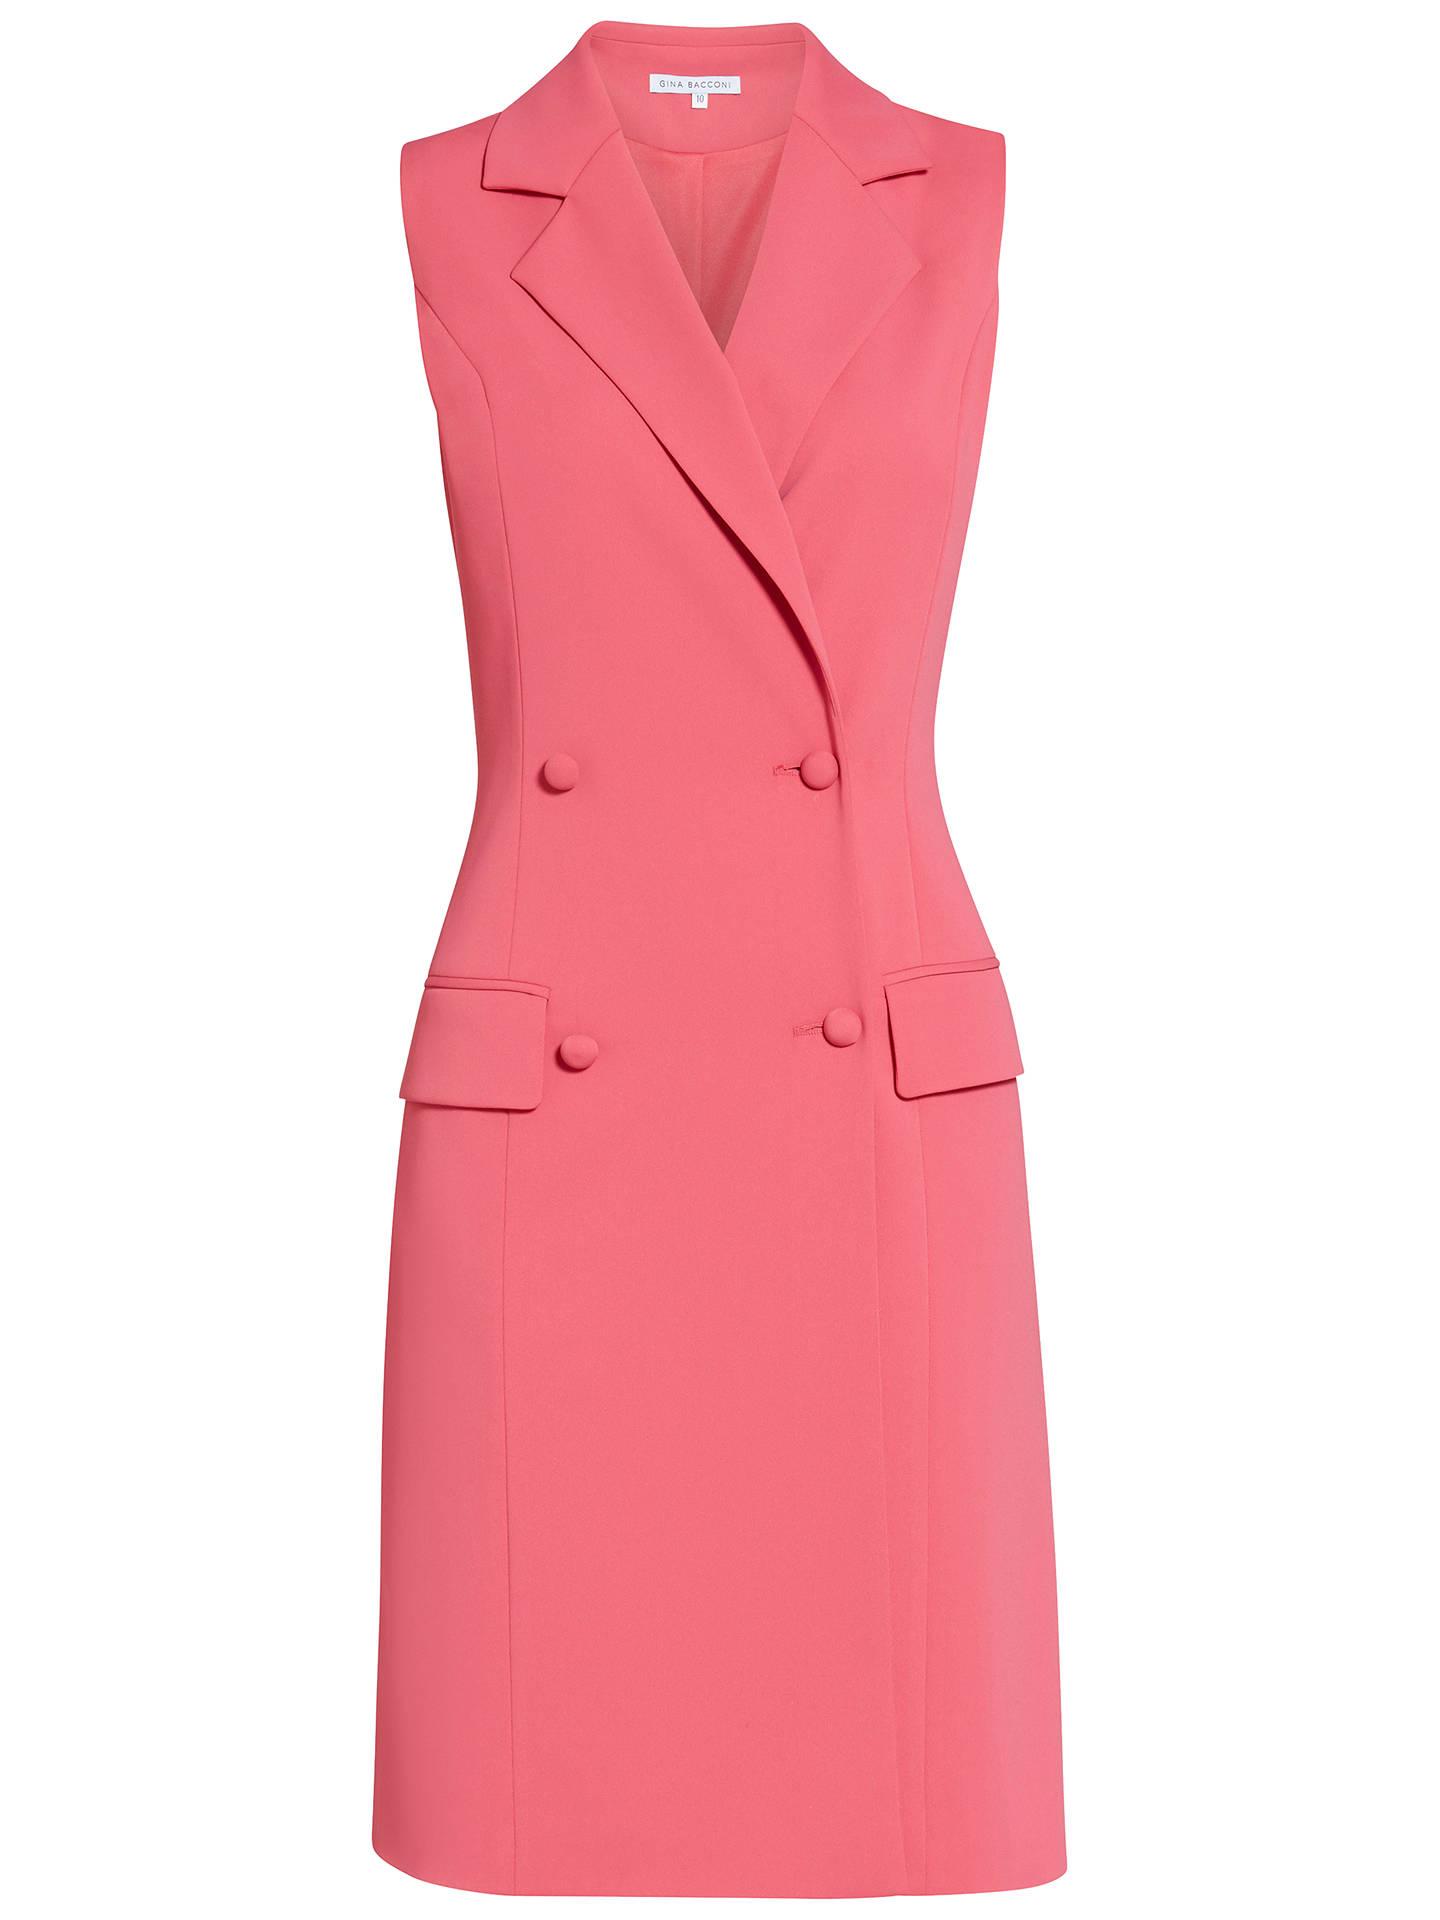 Gina Bacconi Crepe Double Breasted Coat Dress At John Lewis Partners Magenta Blazer Buygina Coral Red 8 Online Johnlewis